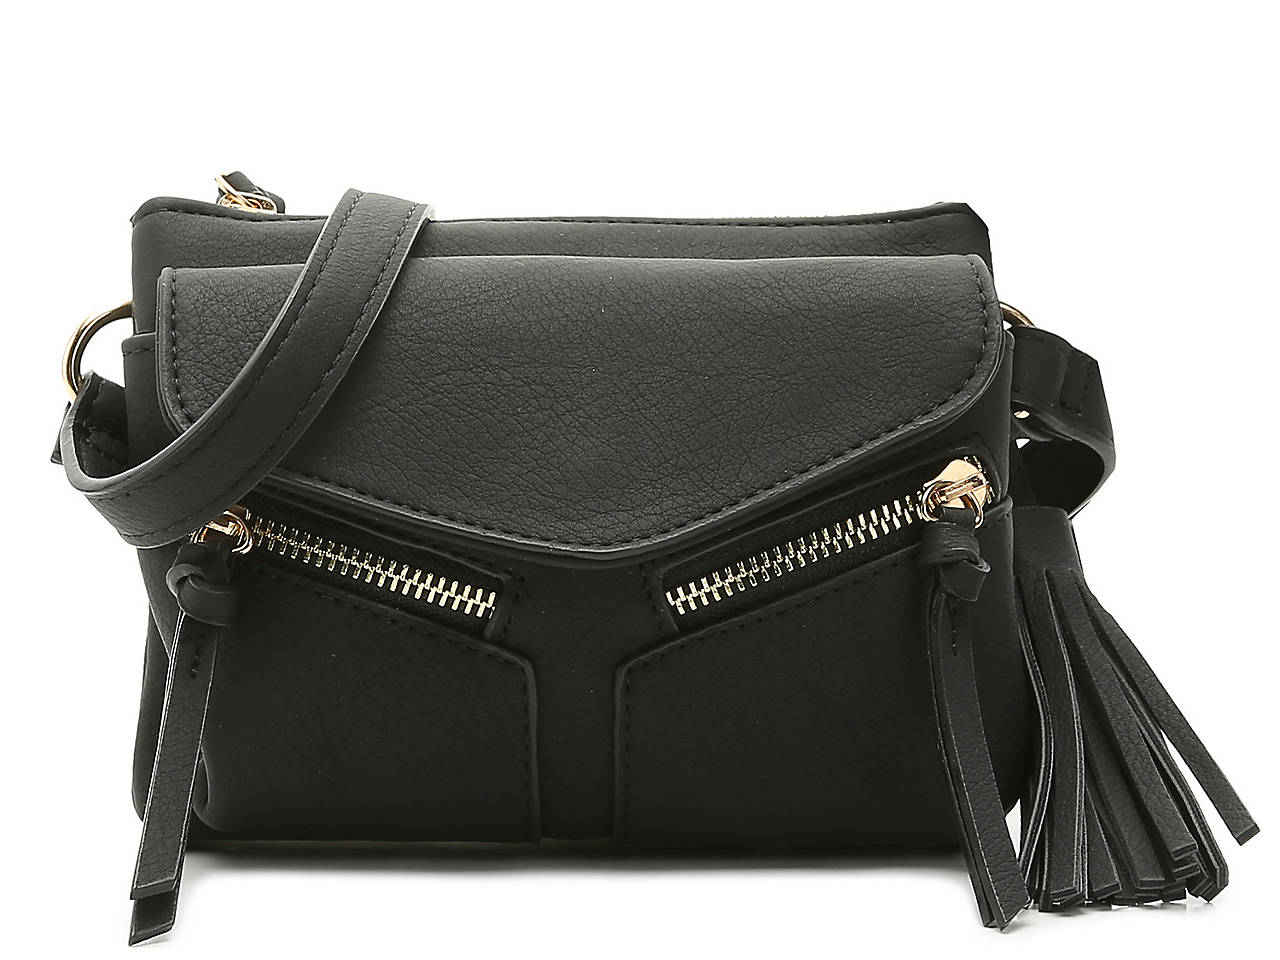 070e8d5814fc Violet Ray Mini Leanna Crossbody Bag Women s Handbags   Accessories ...